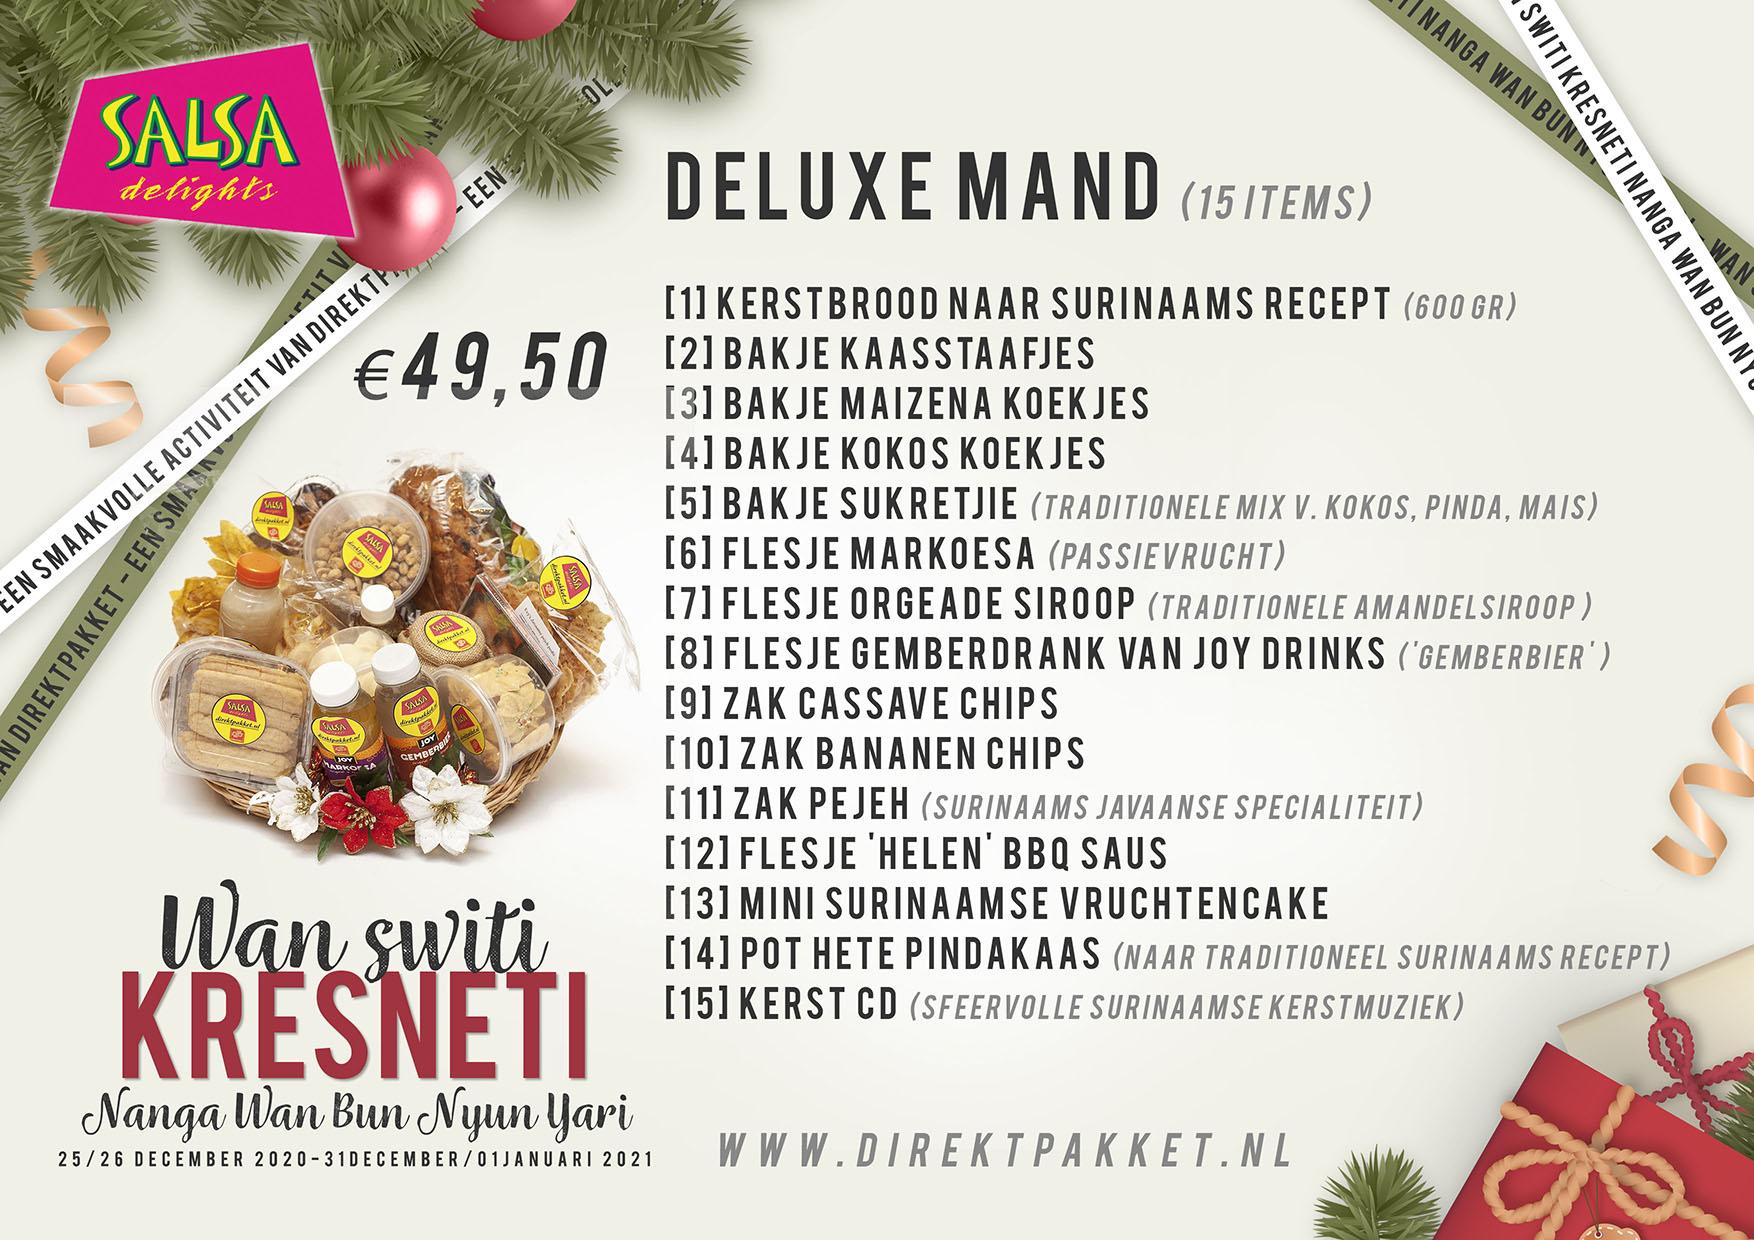 Label Inhoud deLuxe kerstpakket A5